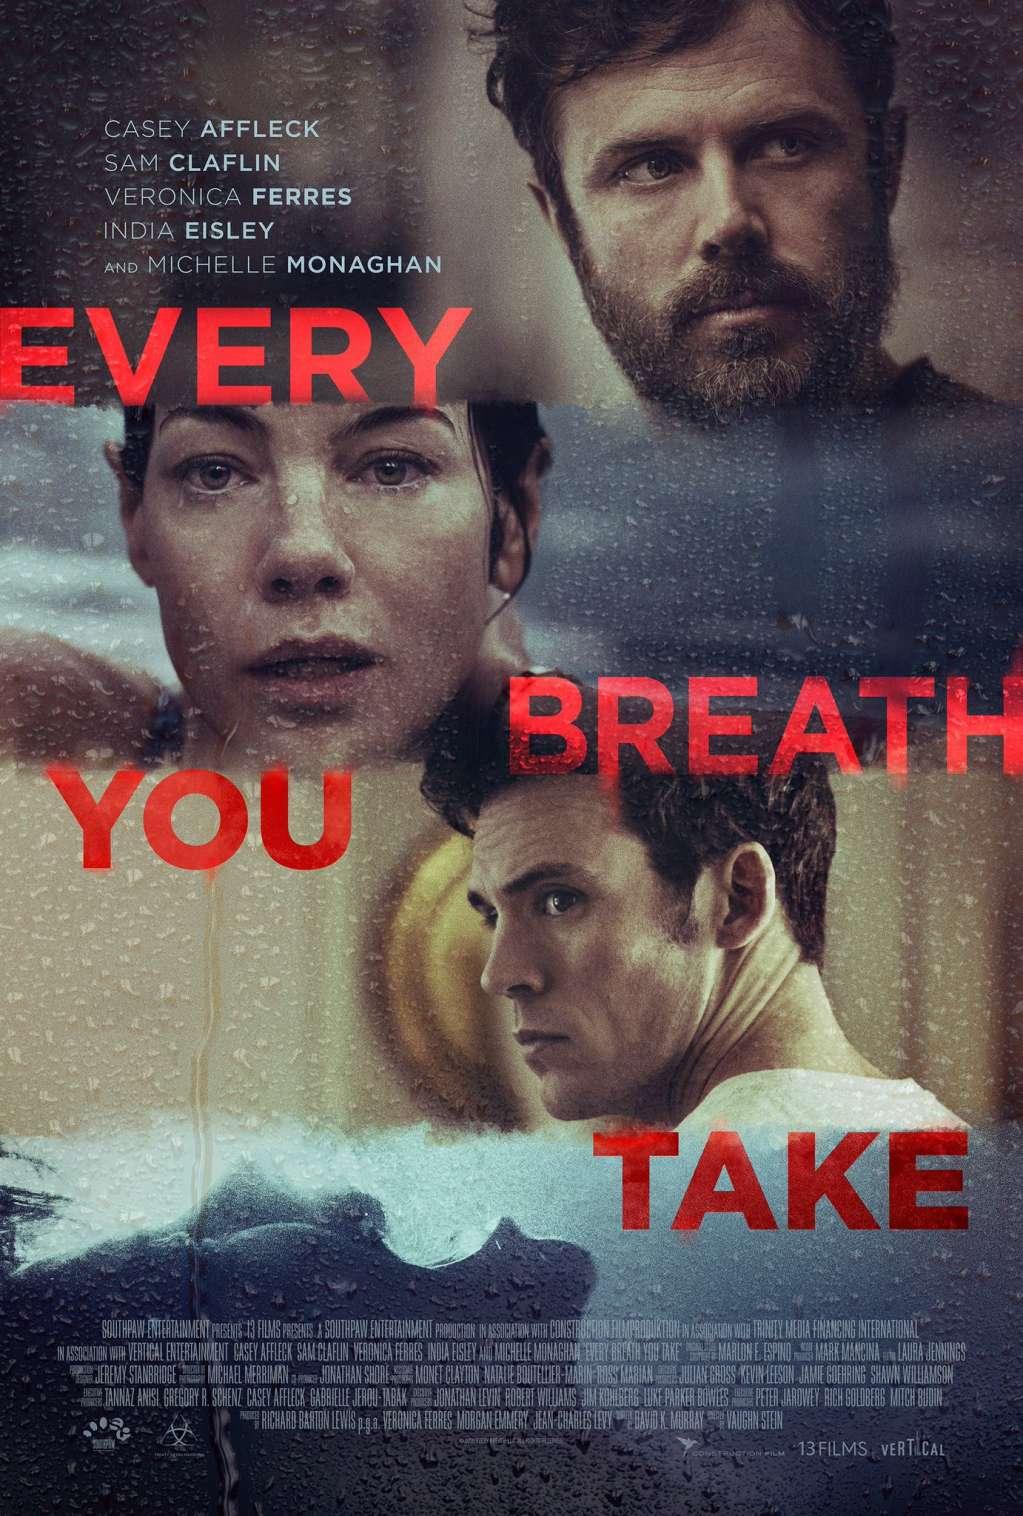 Every Breath You Take kapak